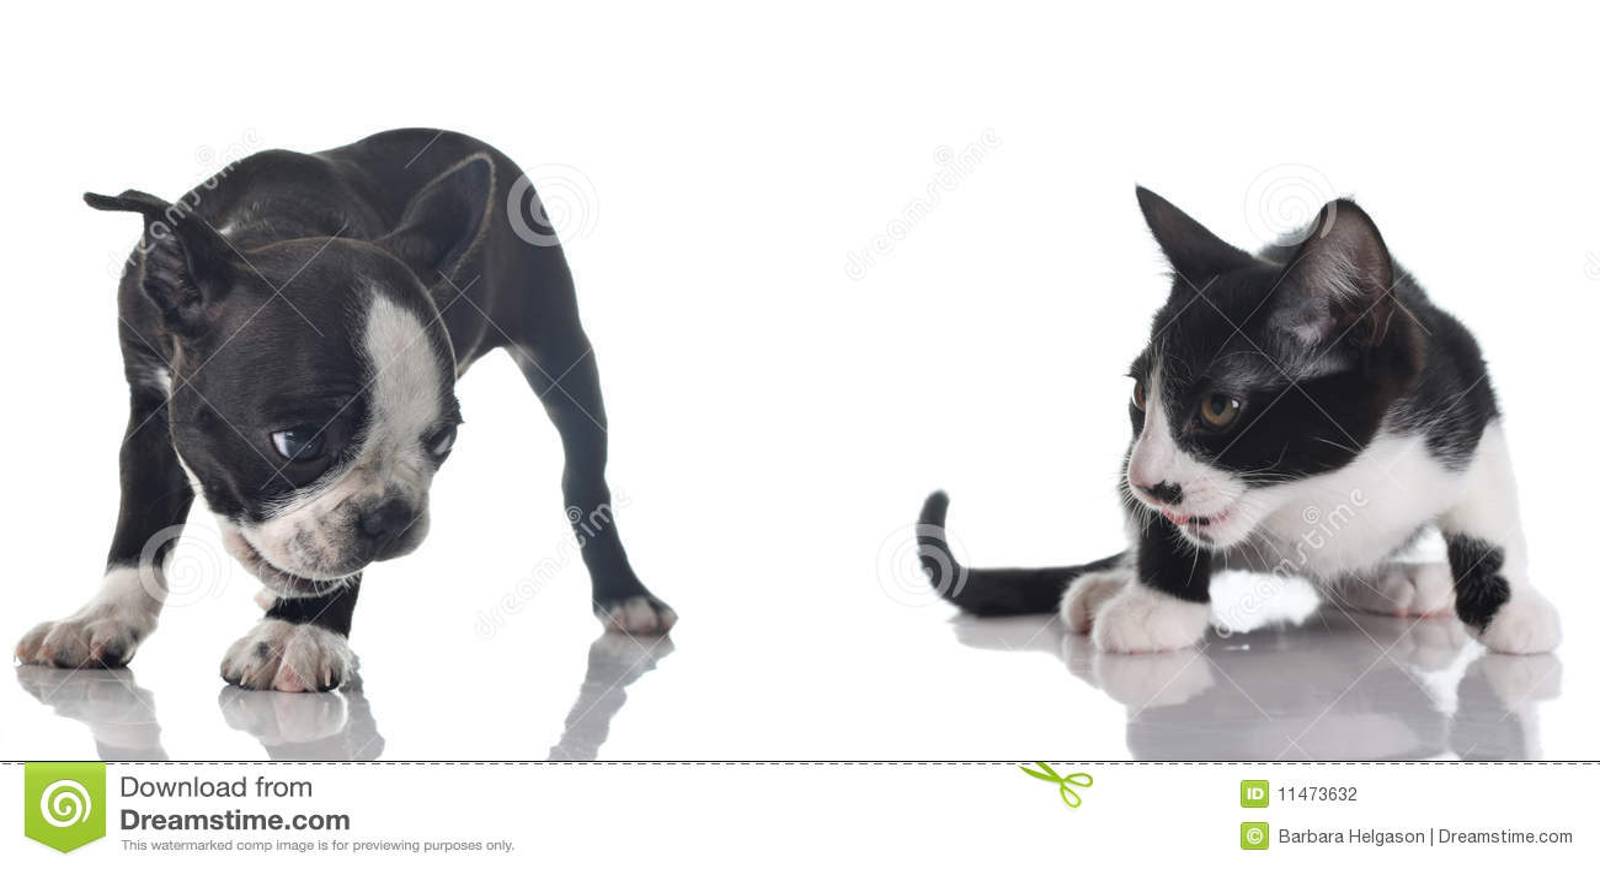 animal shelter el paso